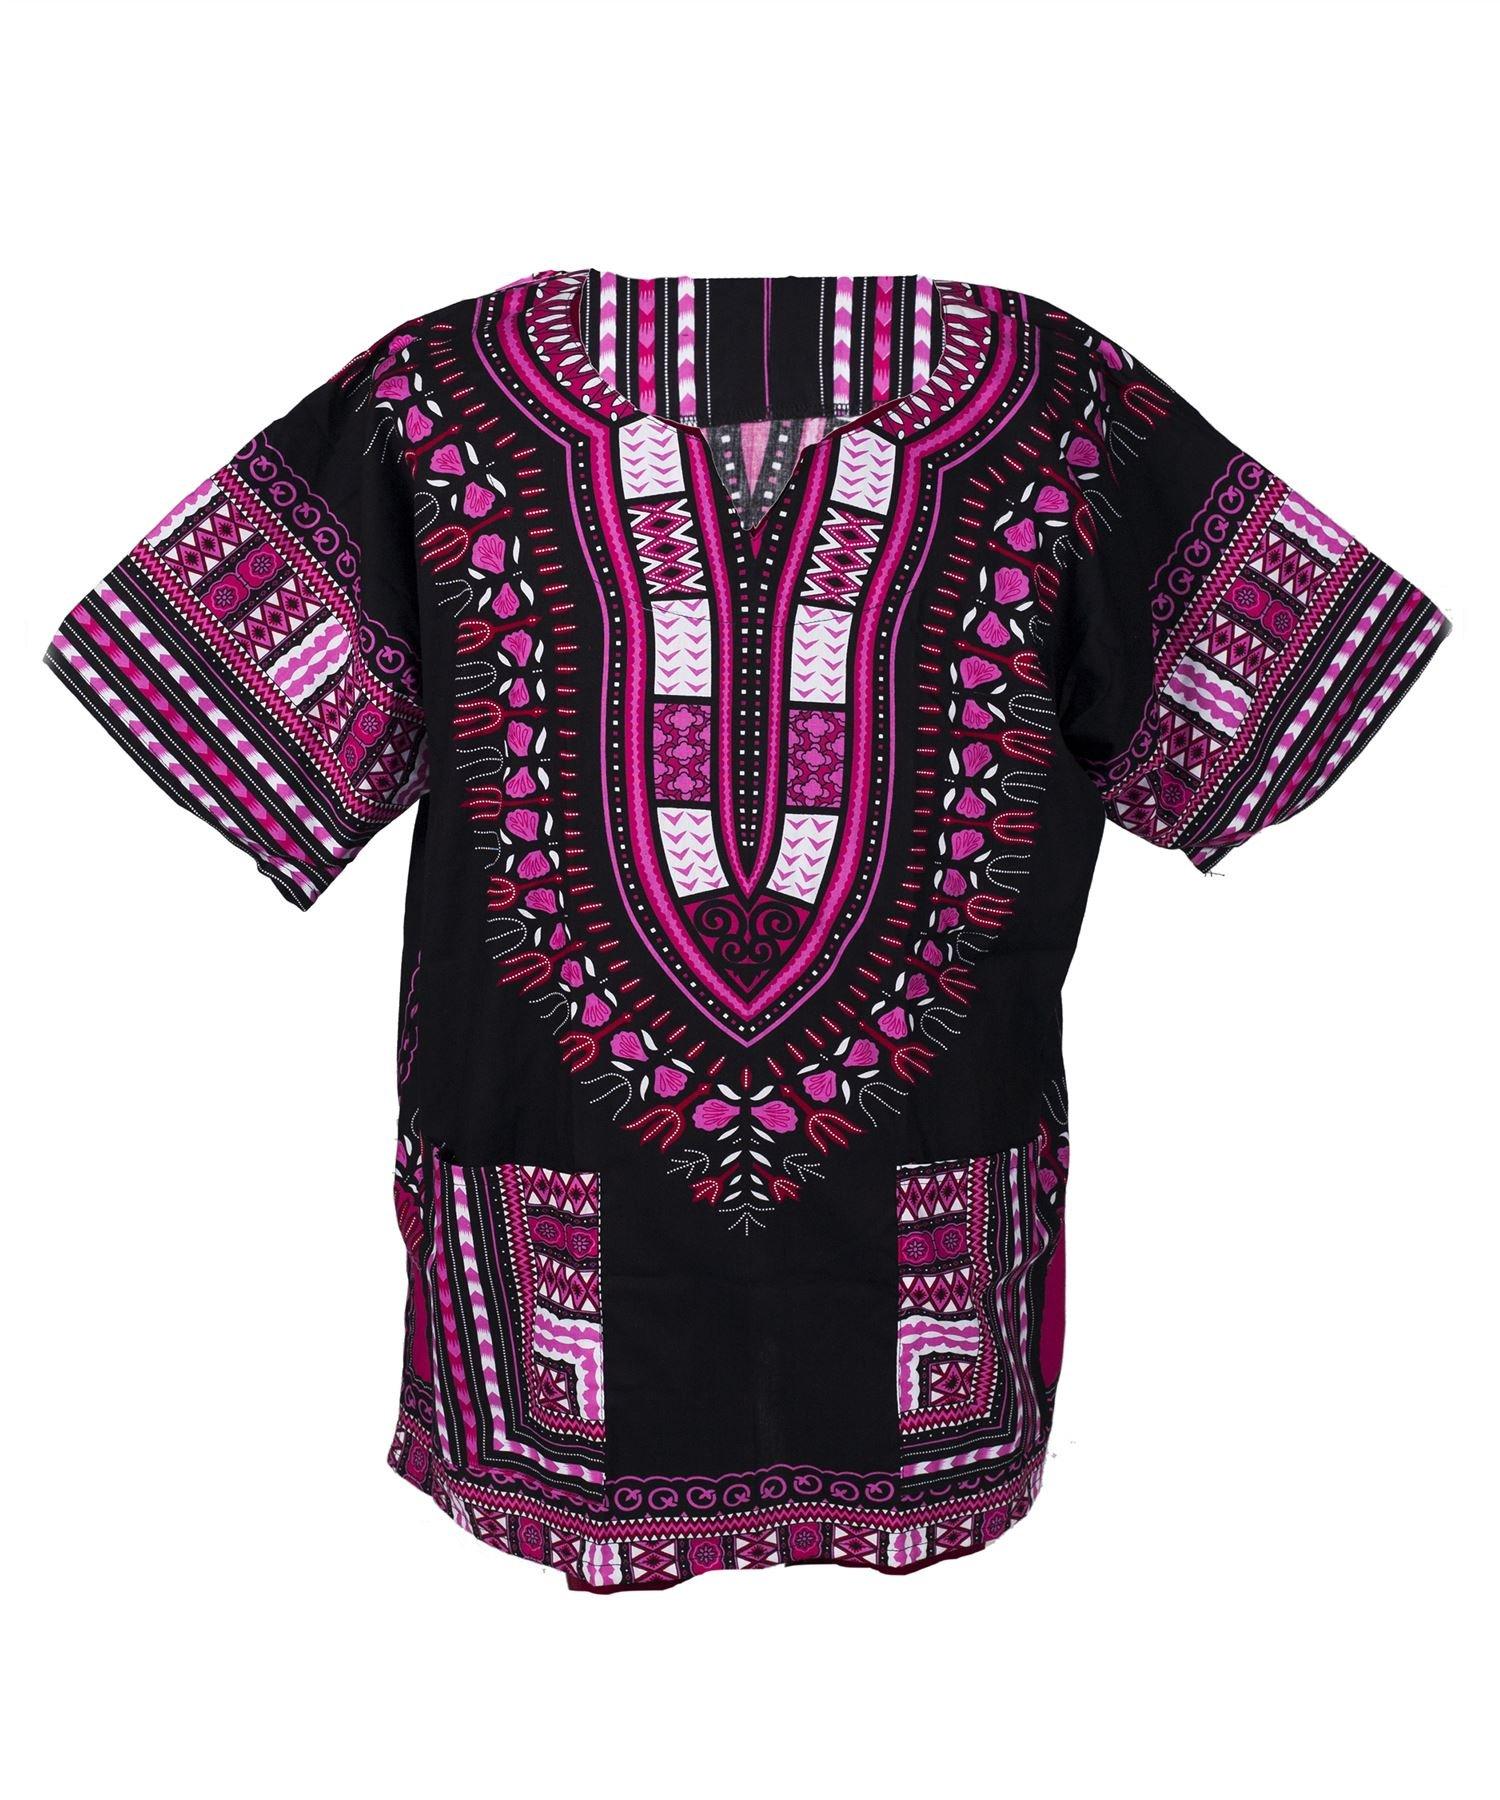 Lofbaz Traditional African Print Unisex Dashiki Size XXL Black and Pink